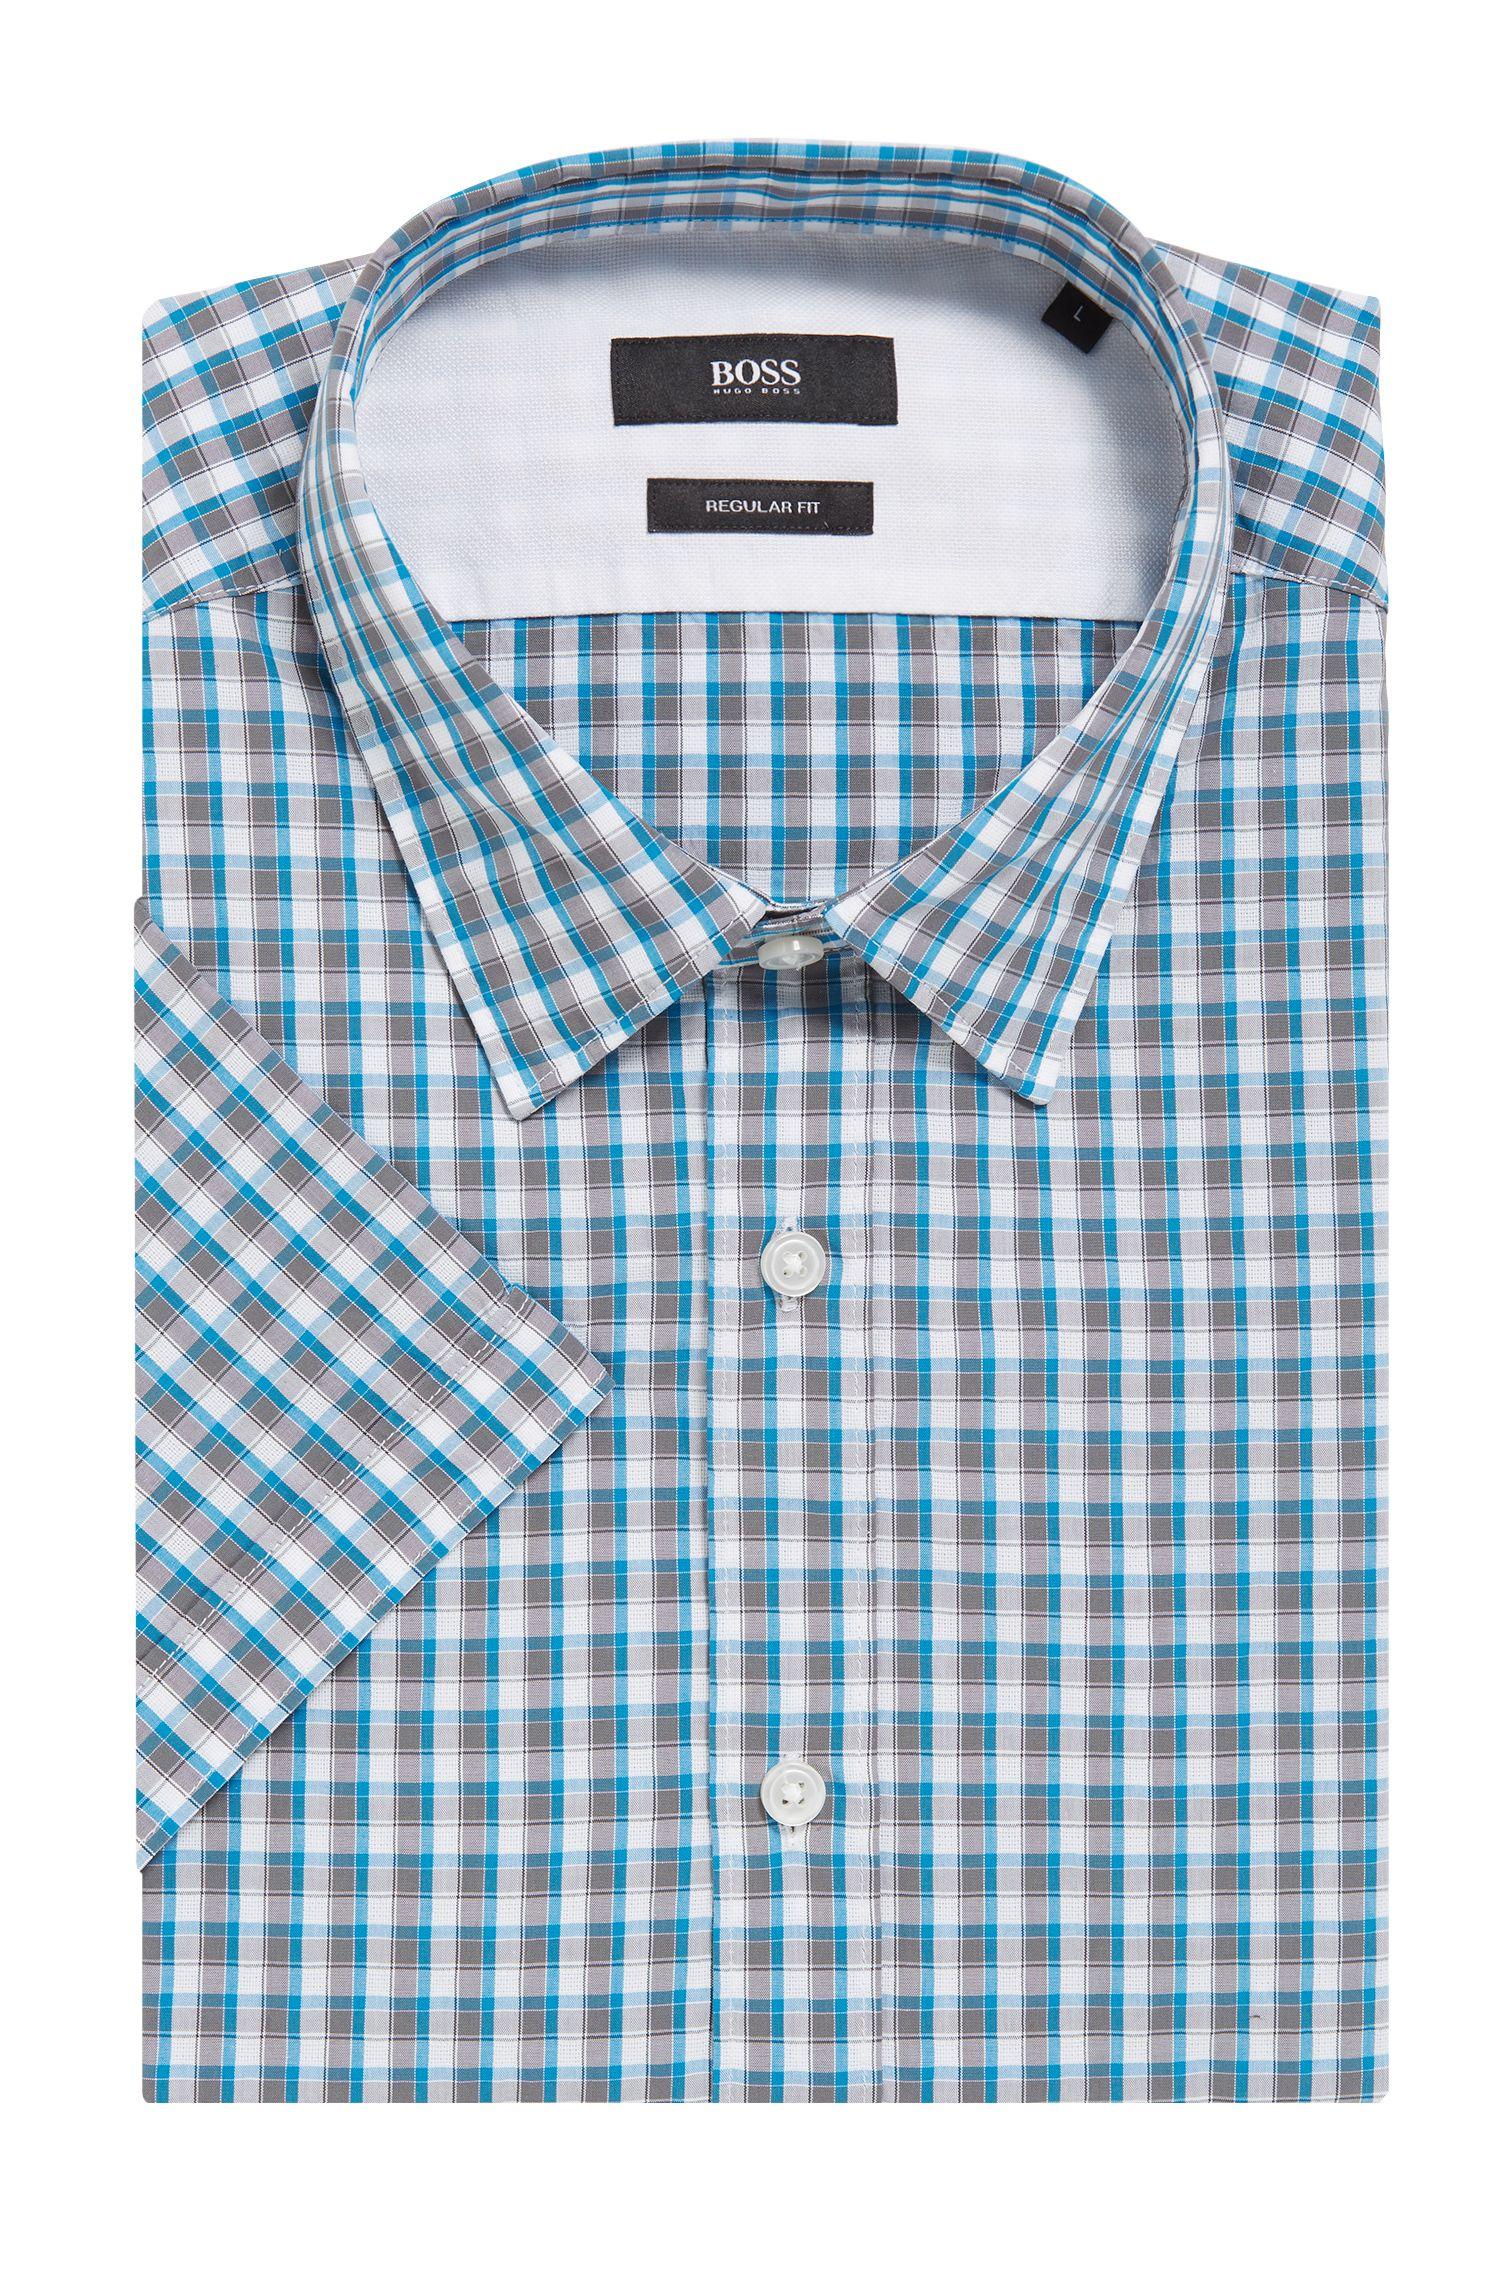 Check Cotton Button Down Shirt, Regular Fit | Luka, Open Grey